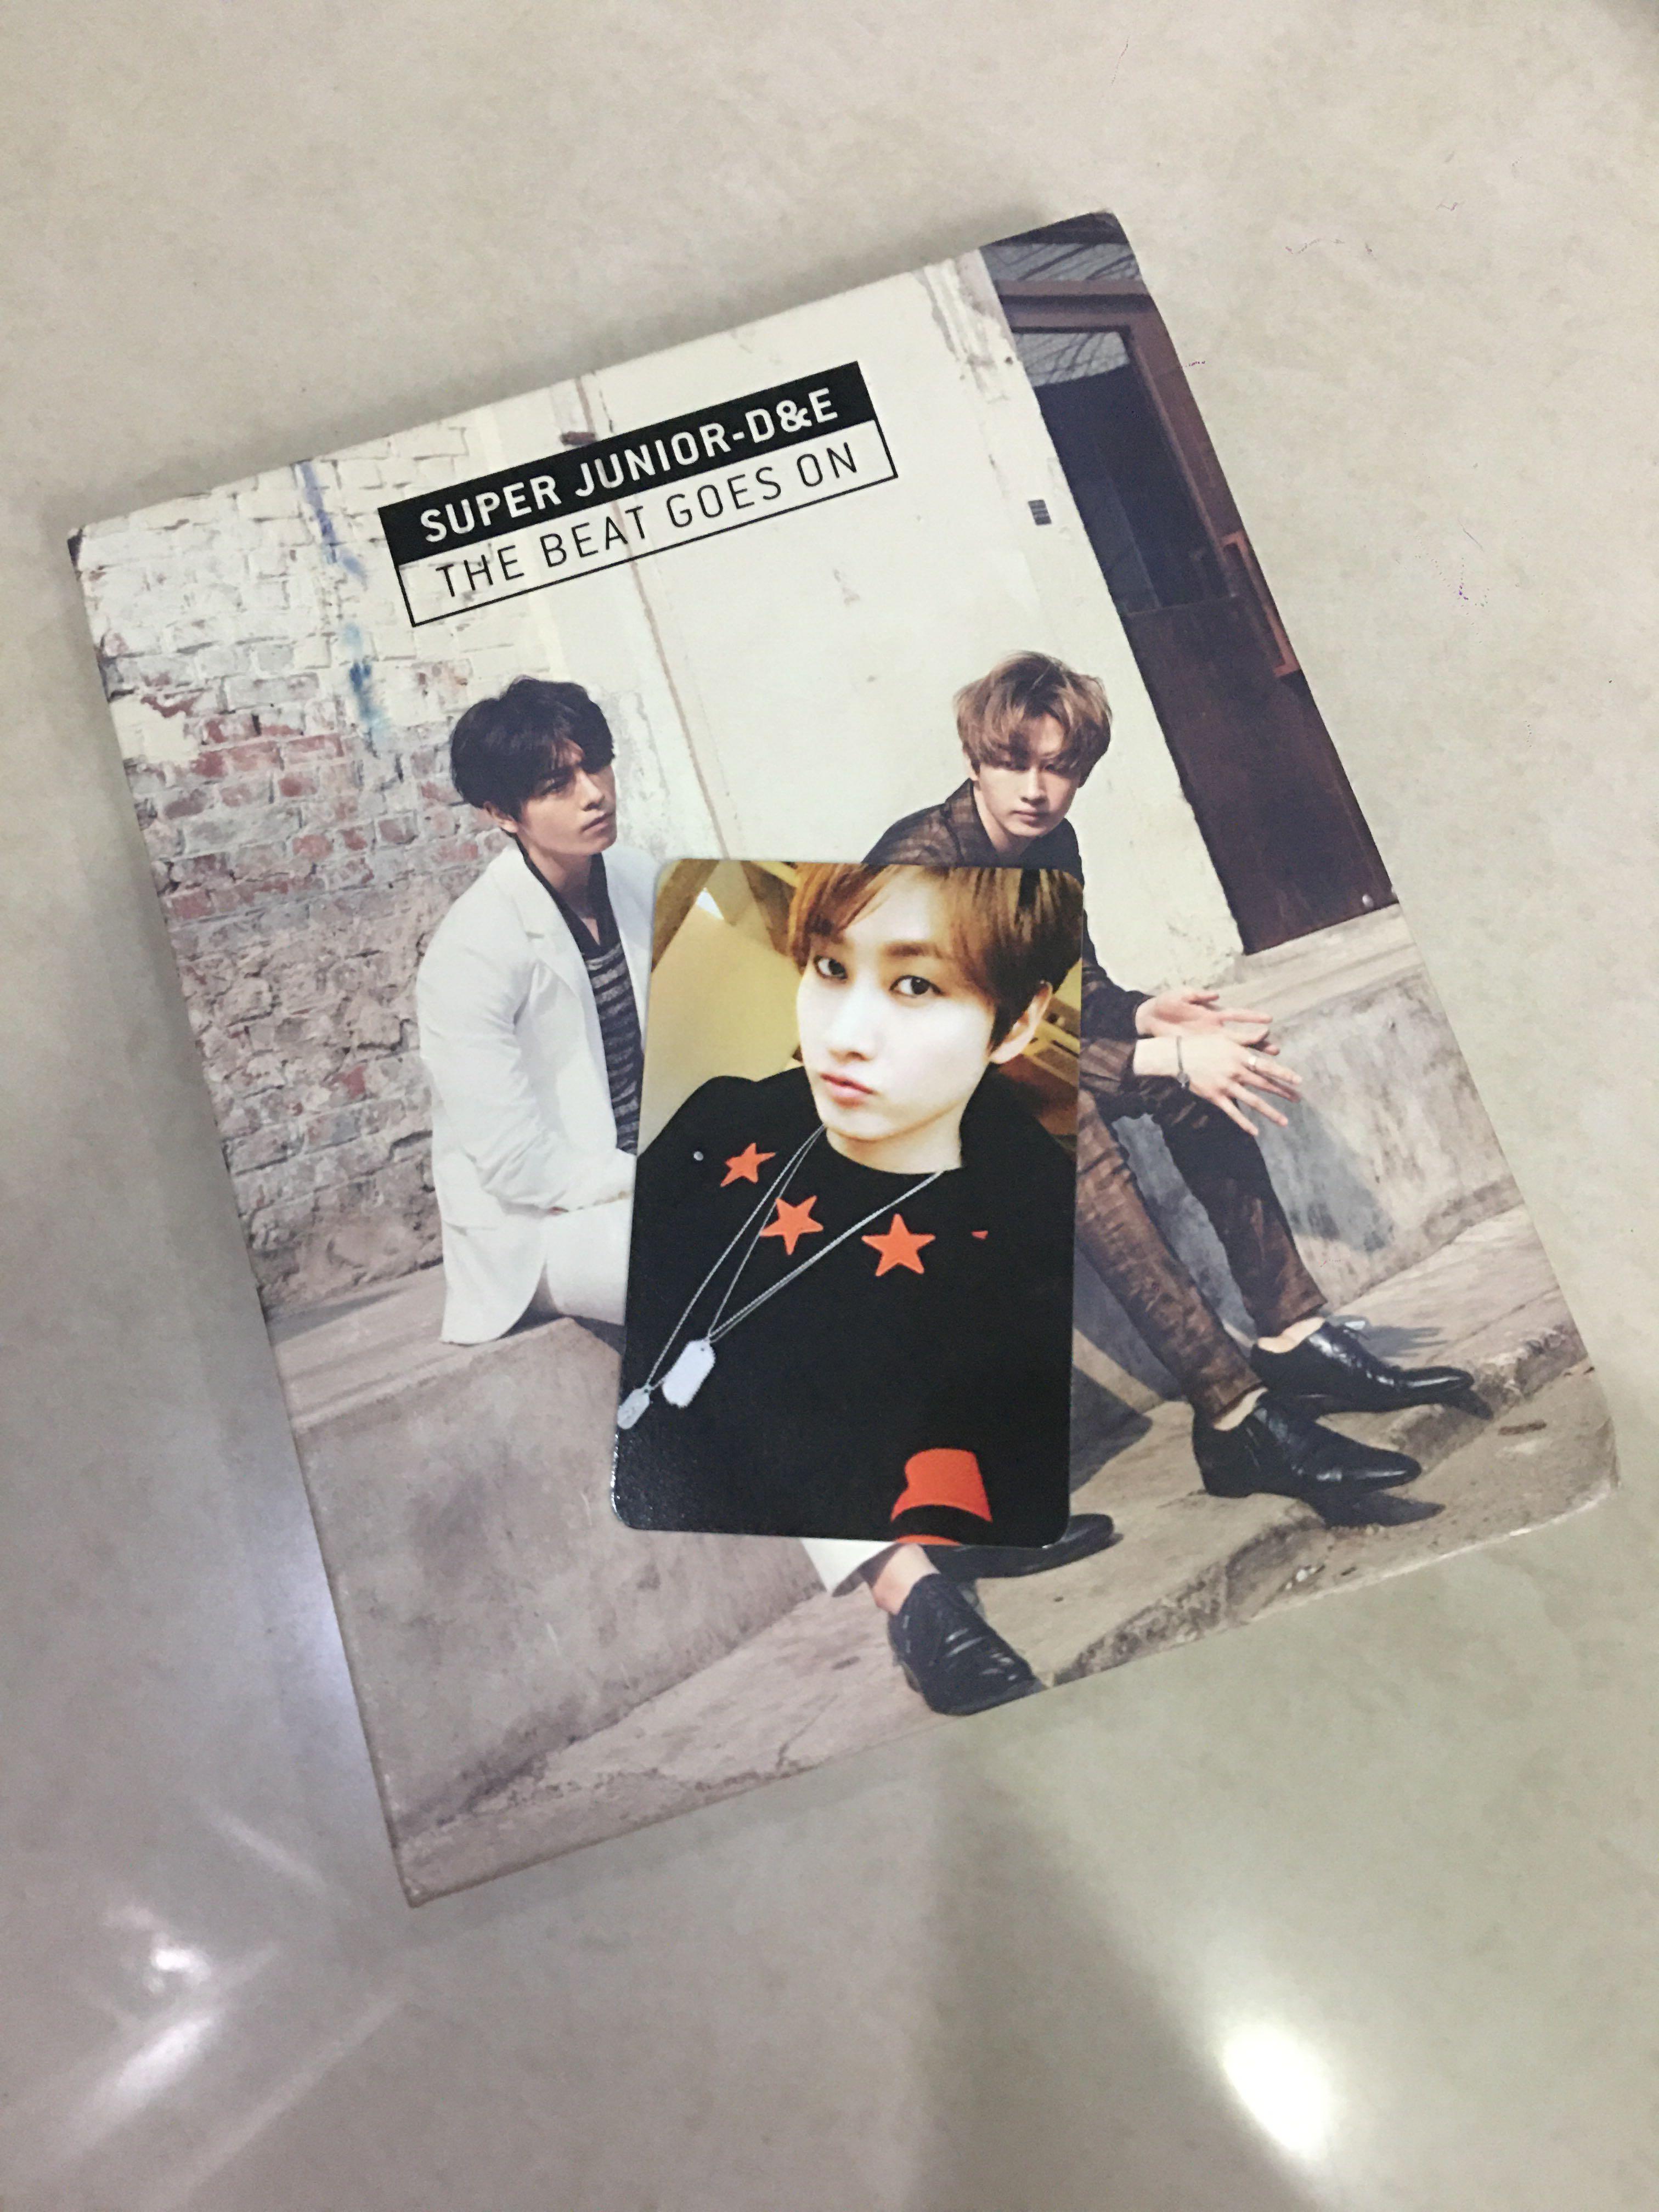 Super Junior D&E The 1st Mini Album The Beat Goes On Standard Edition